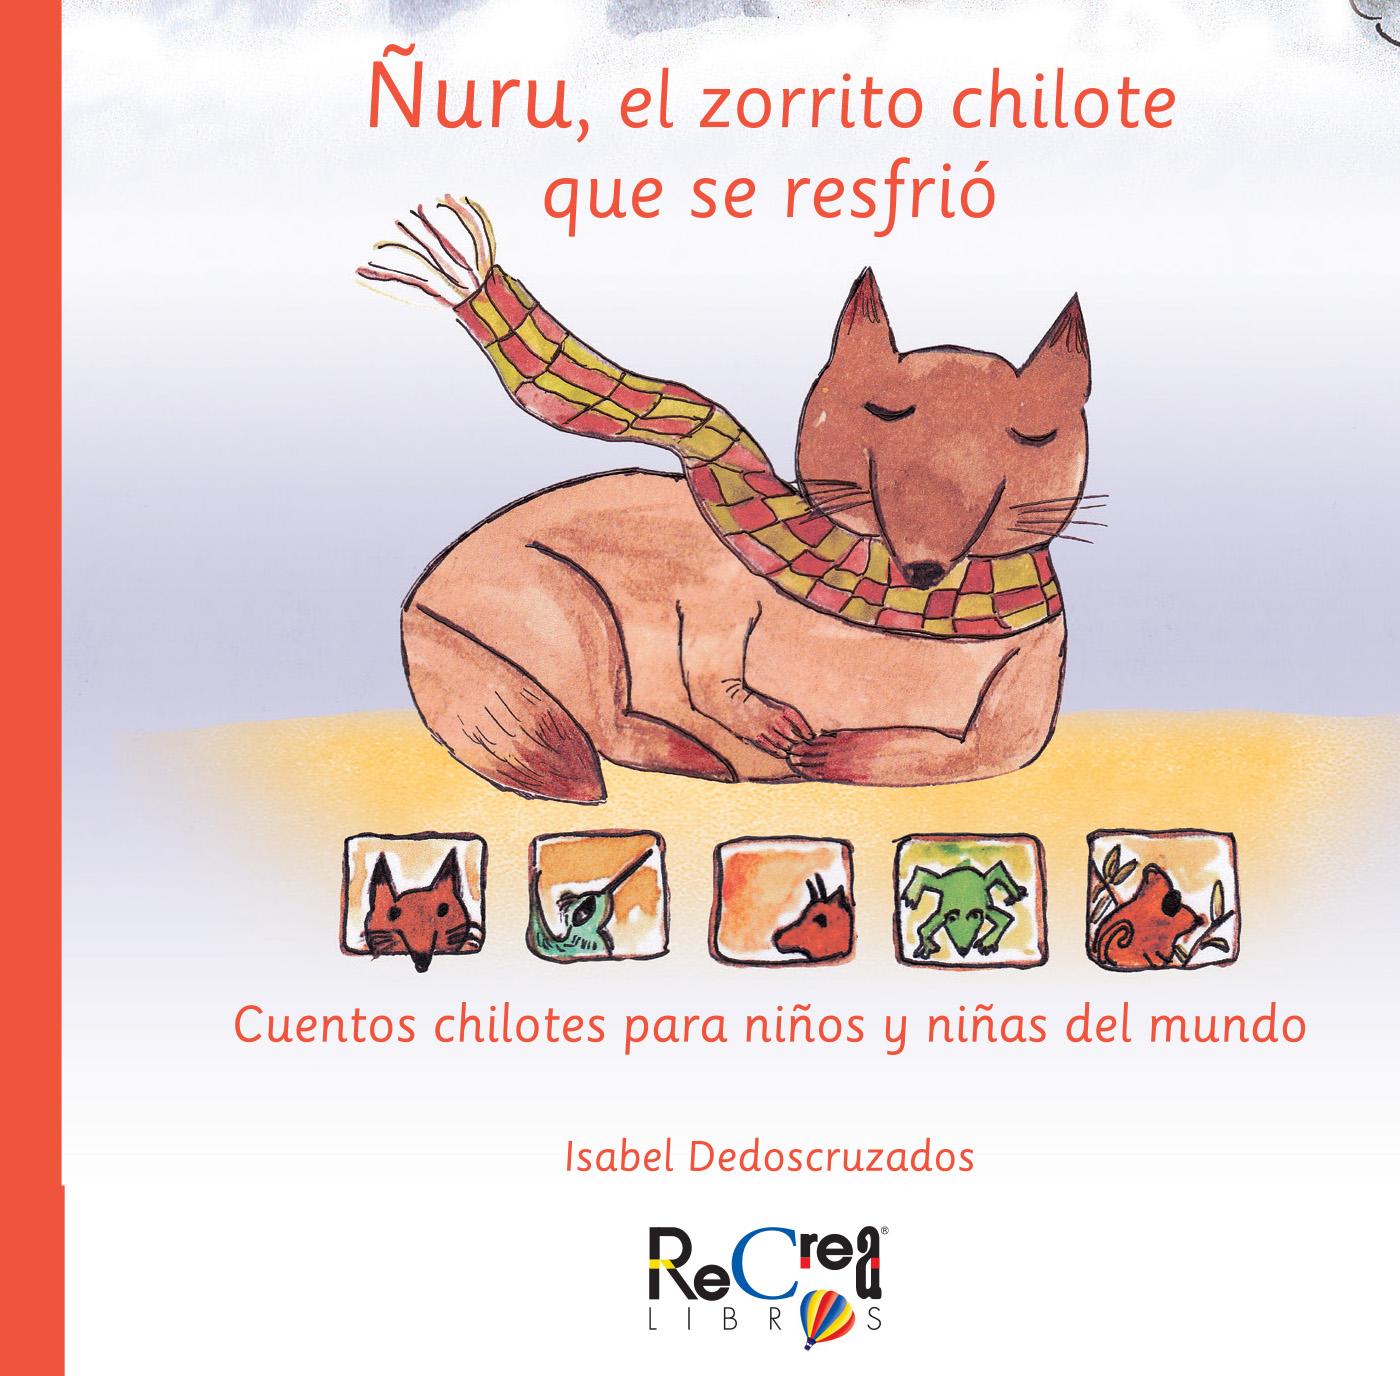 Ñurú, el zorrito chilote que se resfrió Portada